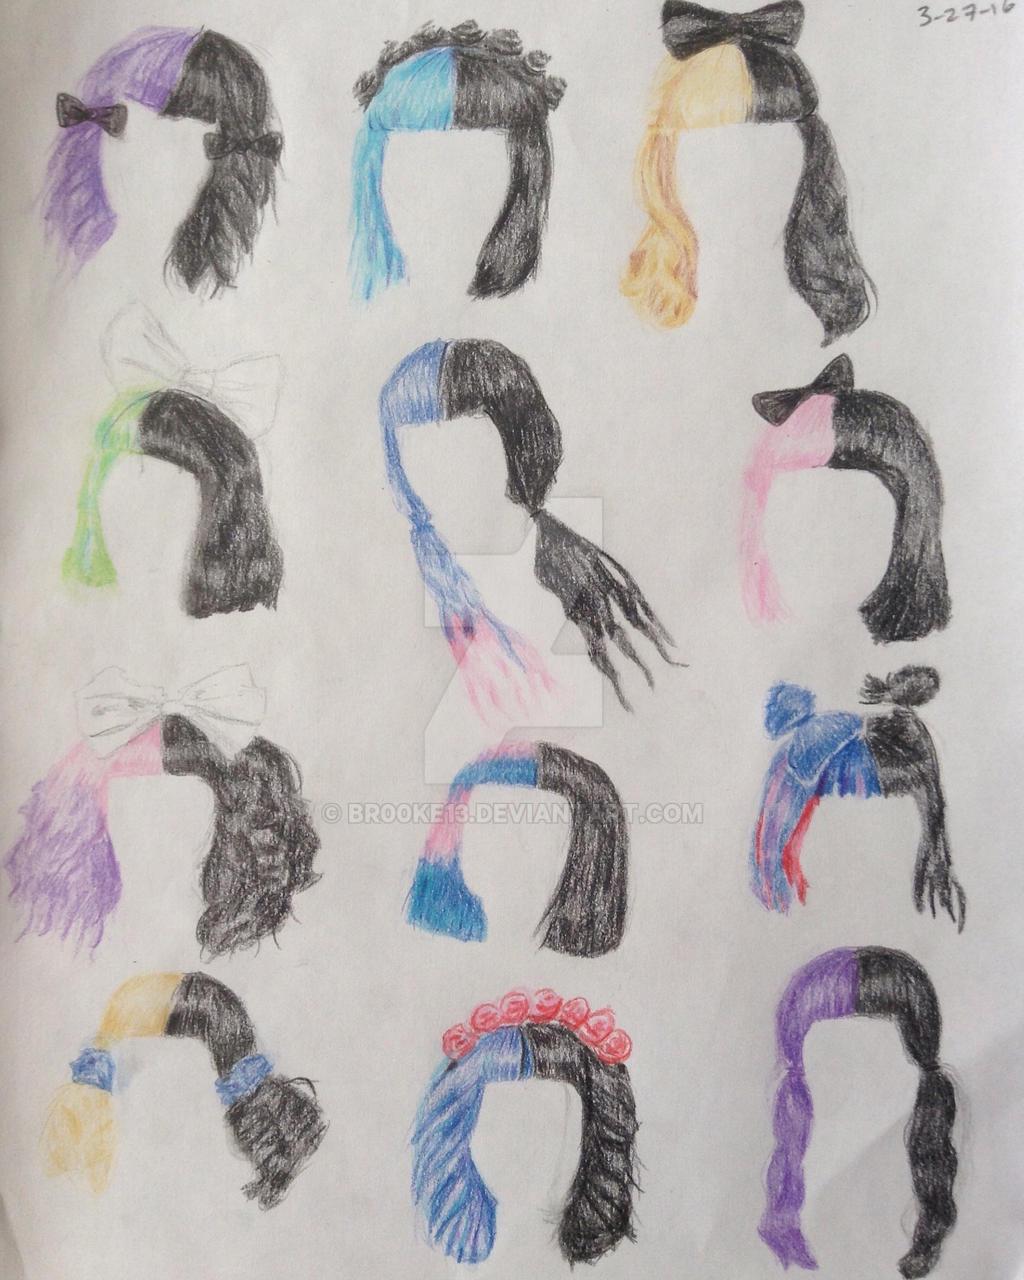 Melanie Martinez Hairstyles By Br00ke13 On Deviantart